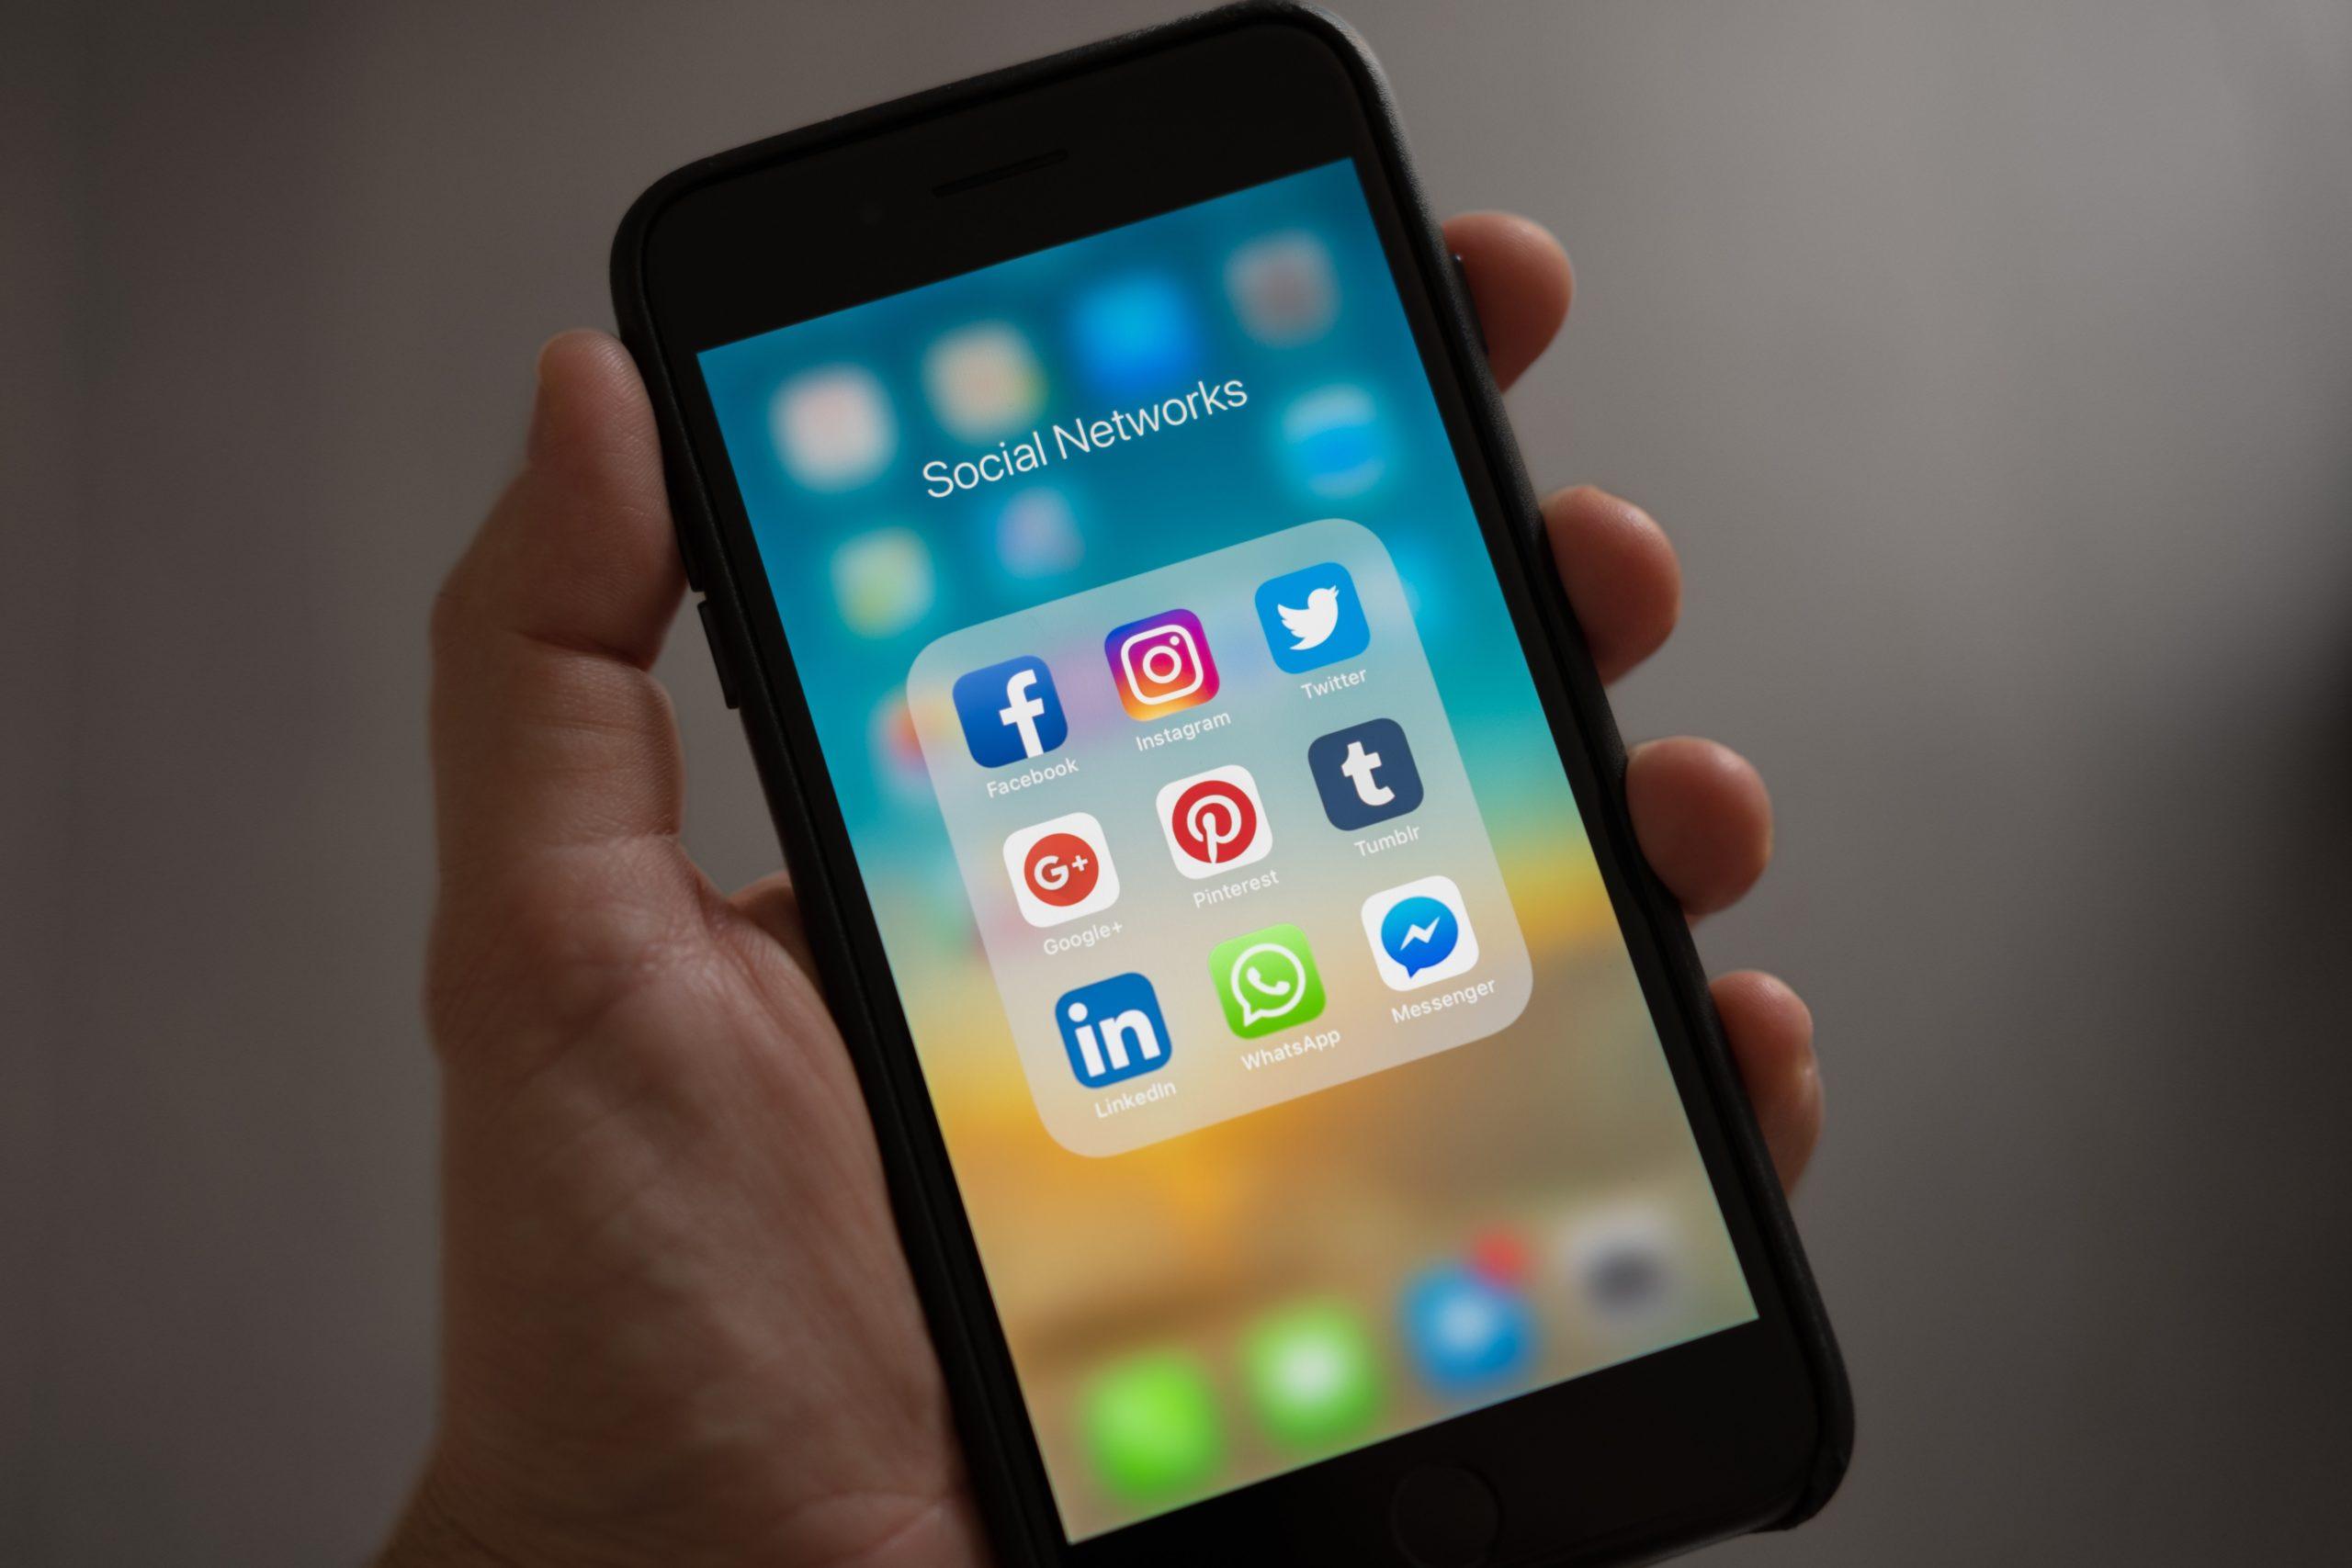 quelle stratégie de marketing digital adopter uand on est coach?